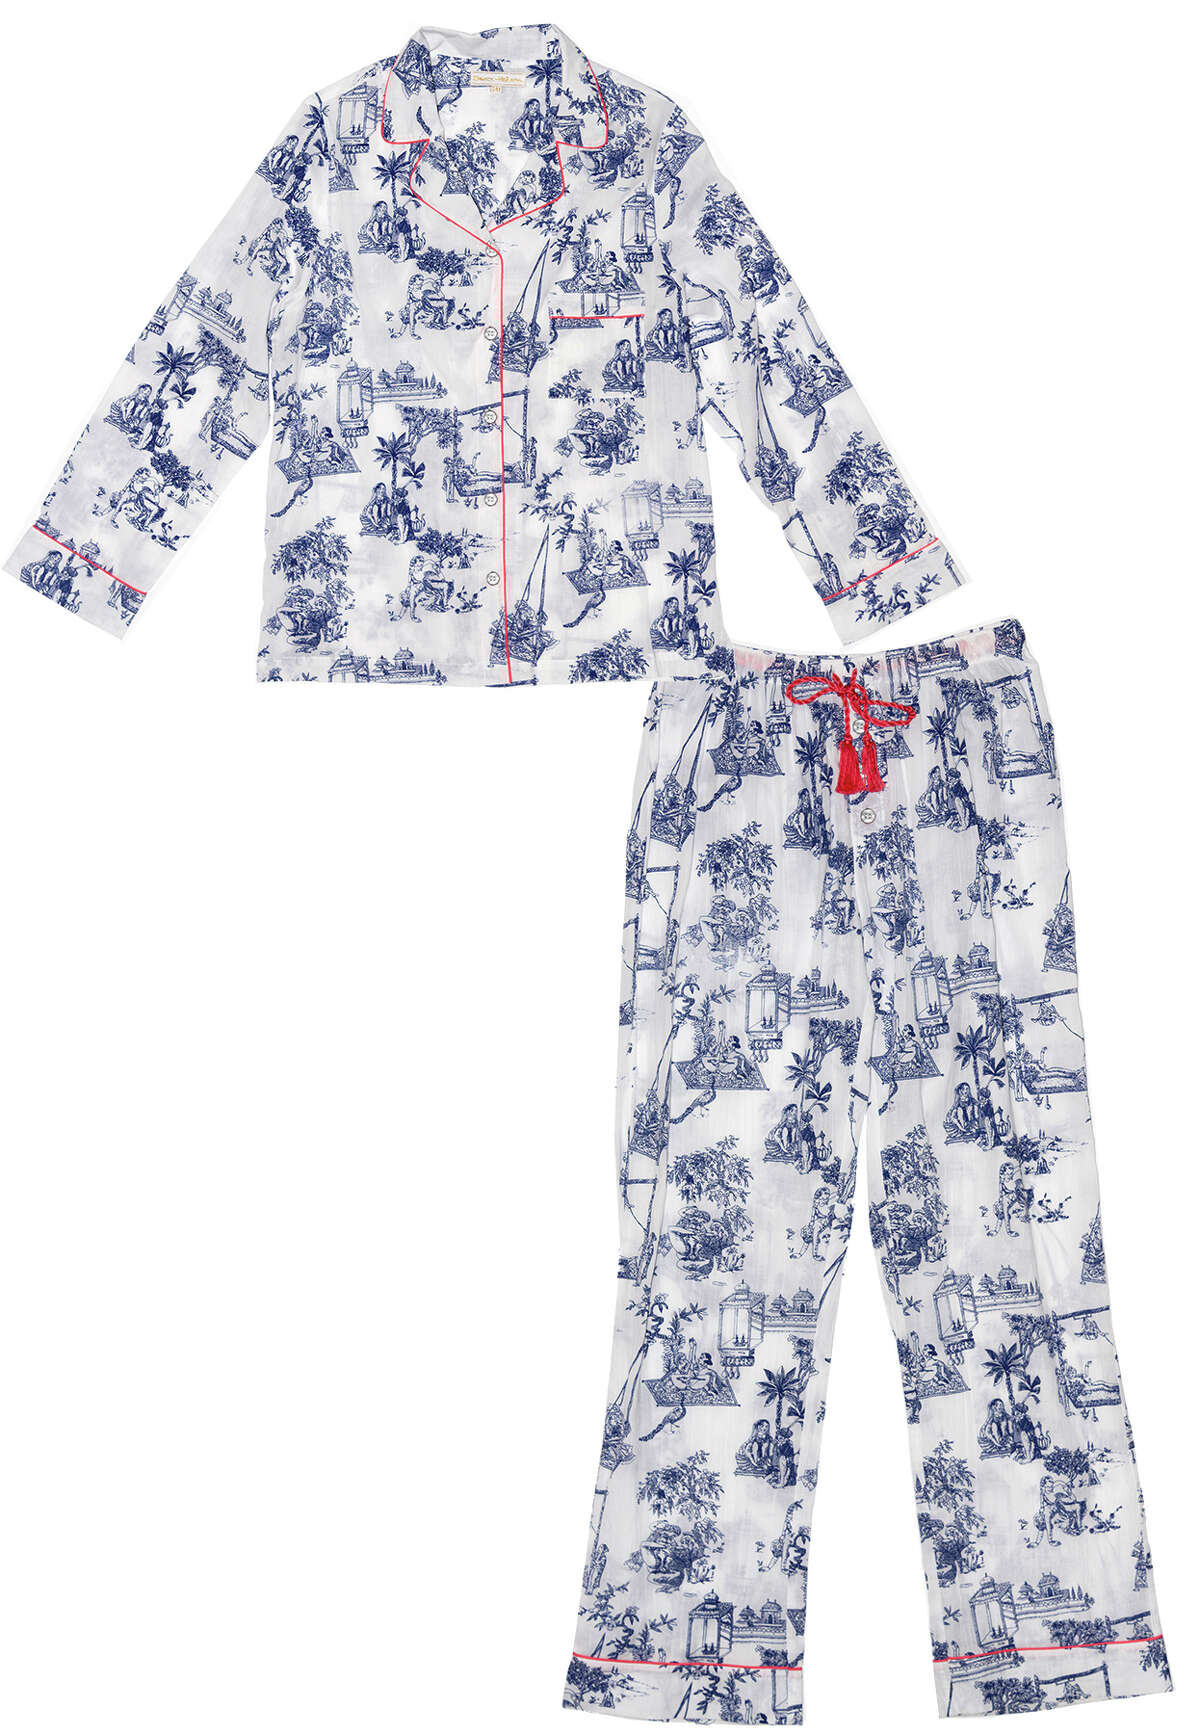 Texas-based Dawson & Hellmann 100% cotton voile Kama Sutra print women?s pajamas; $160 at Kuhl-Linscomb